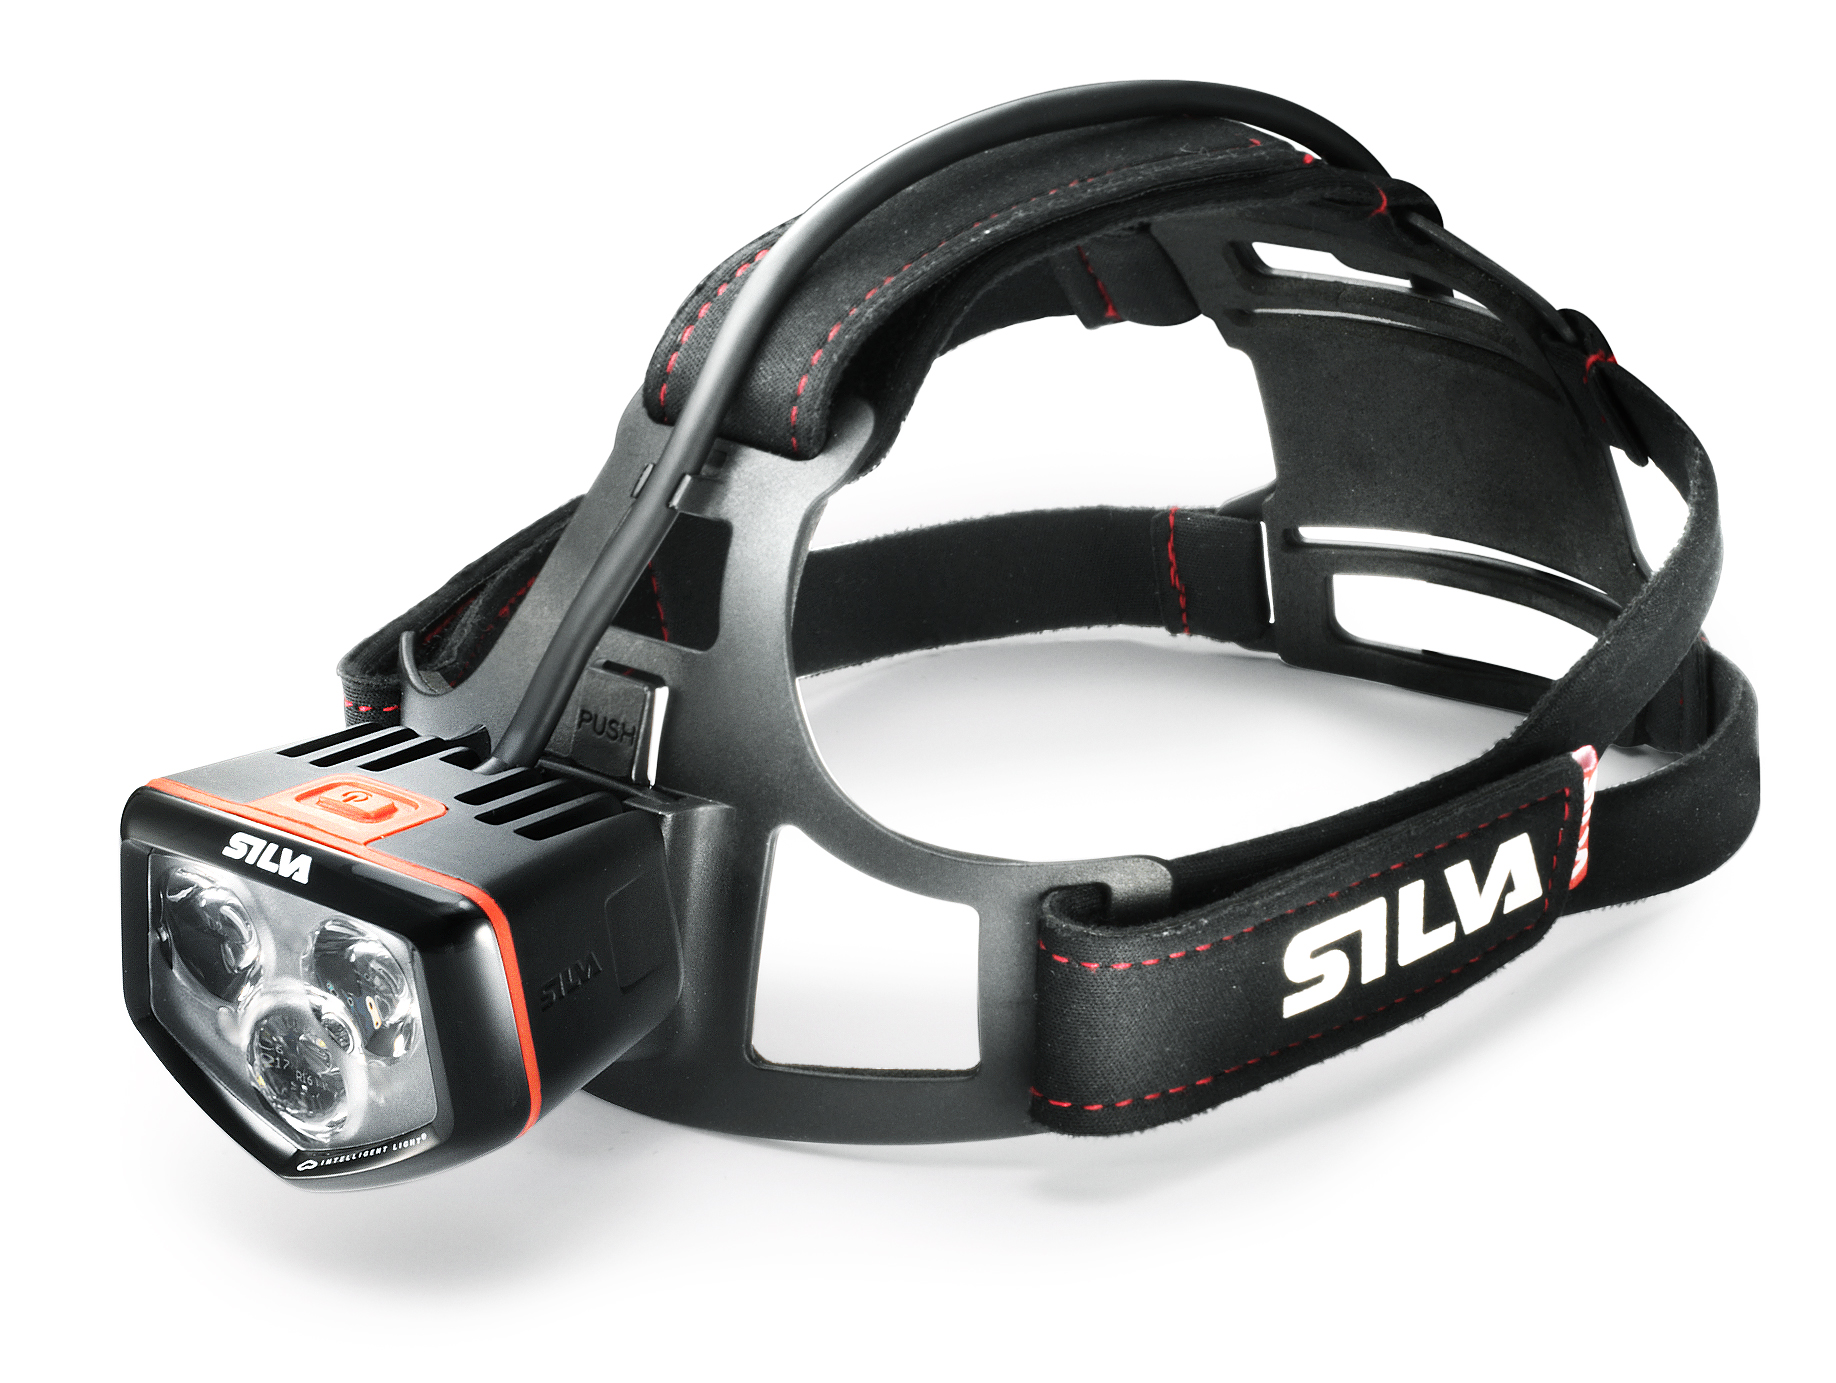 Kända Silva Alpha pannlampa - Silva Sweden AB WY-83